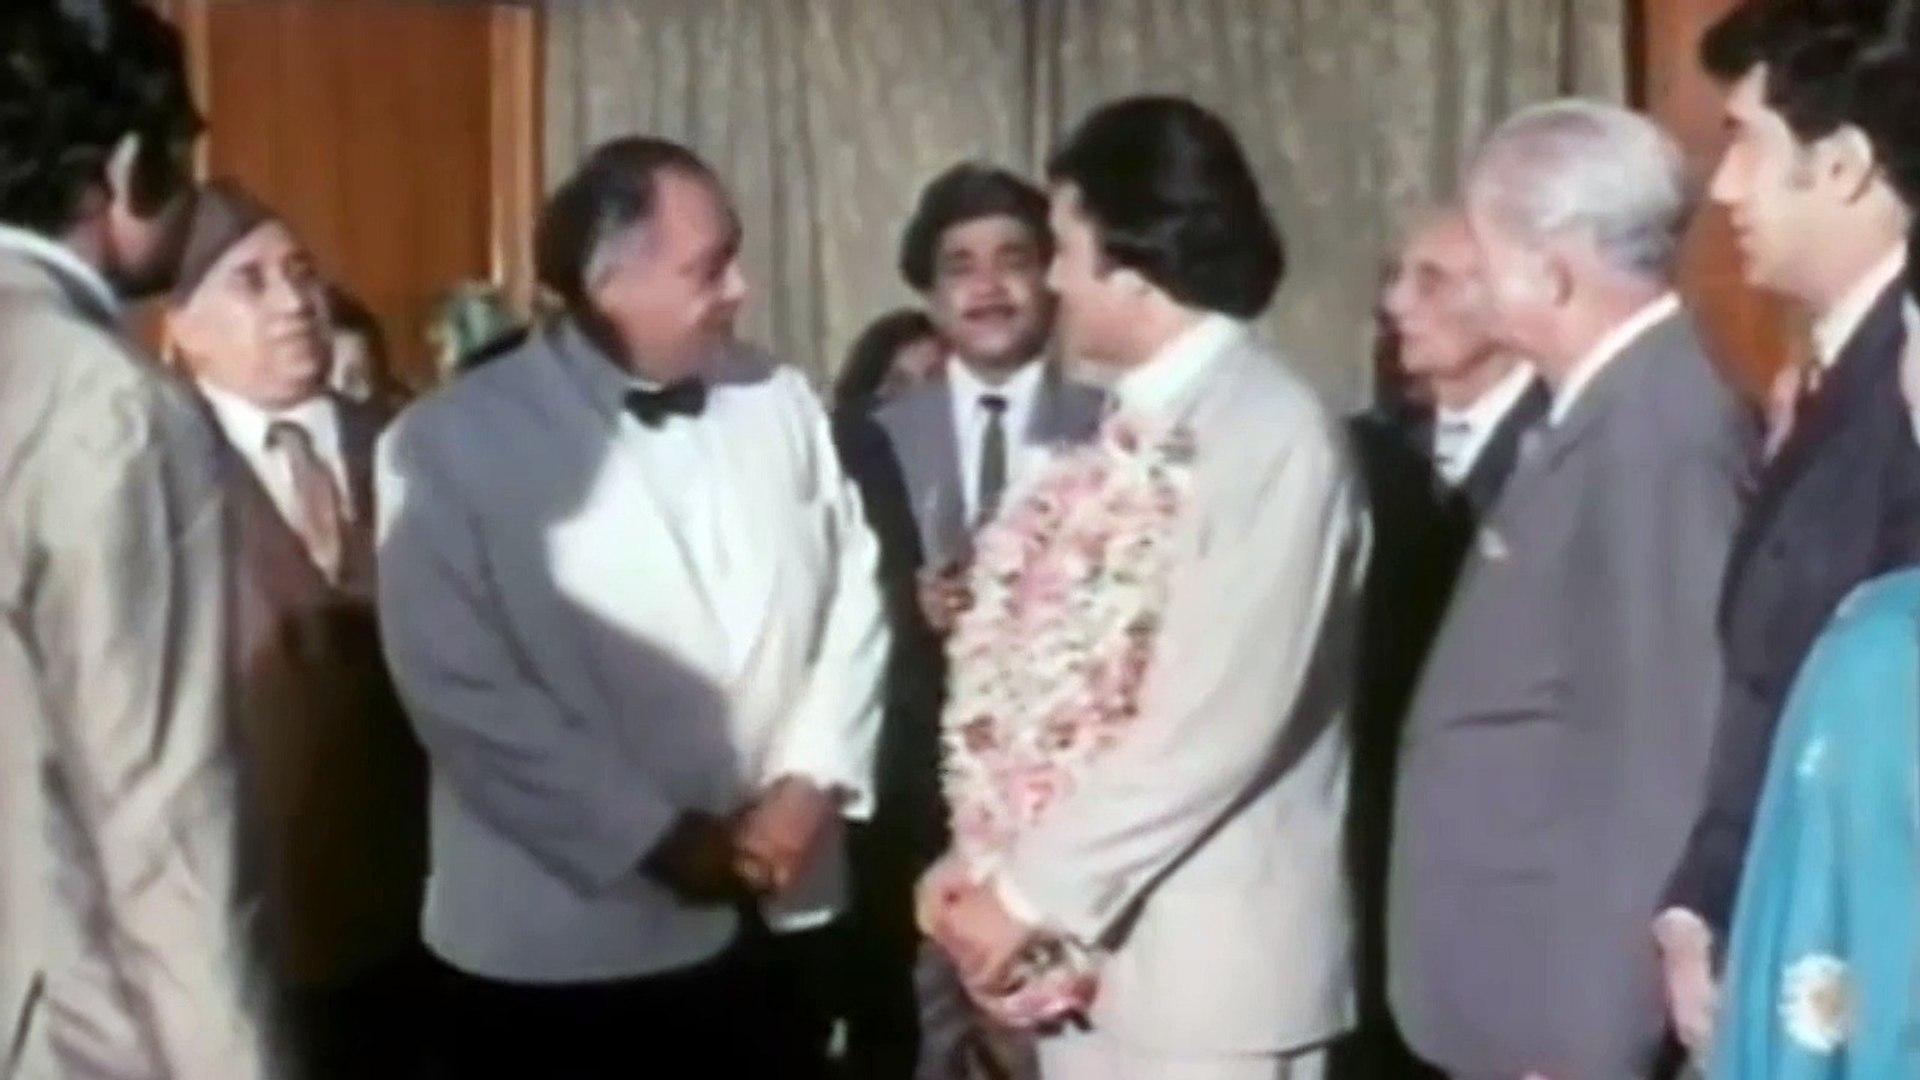 BHOLA BHALA | FULL HINDI MOVIE | PART 6 OF 12 | BEST HINDI MOVIES | POPULAR HINDI FILMS